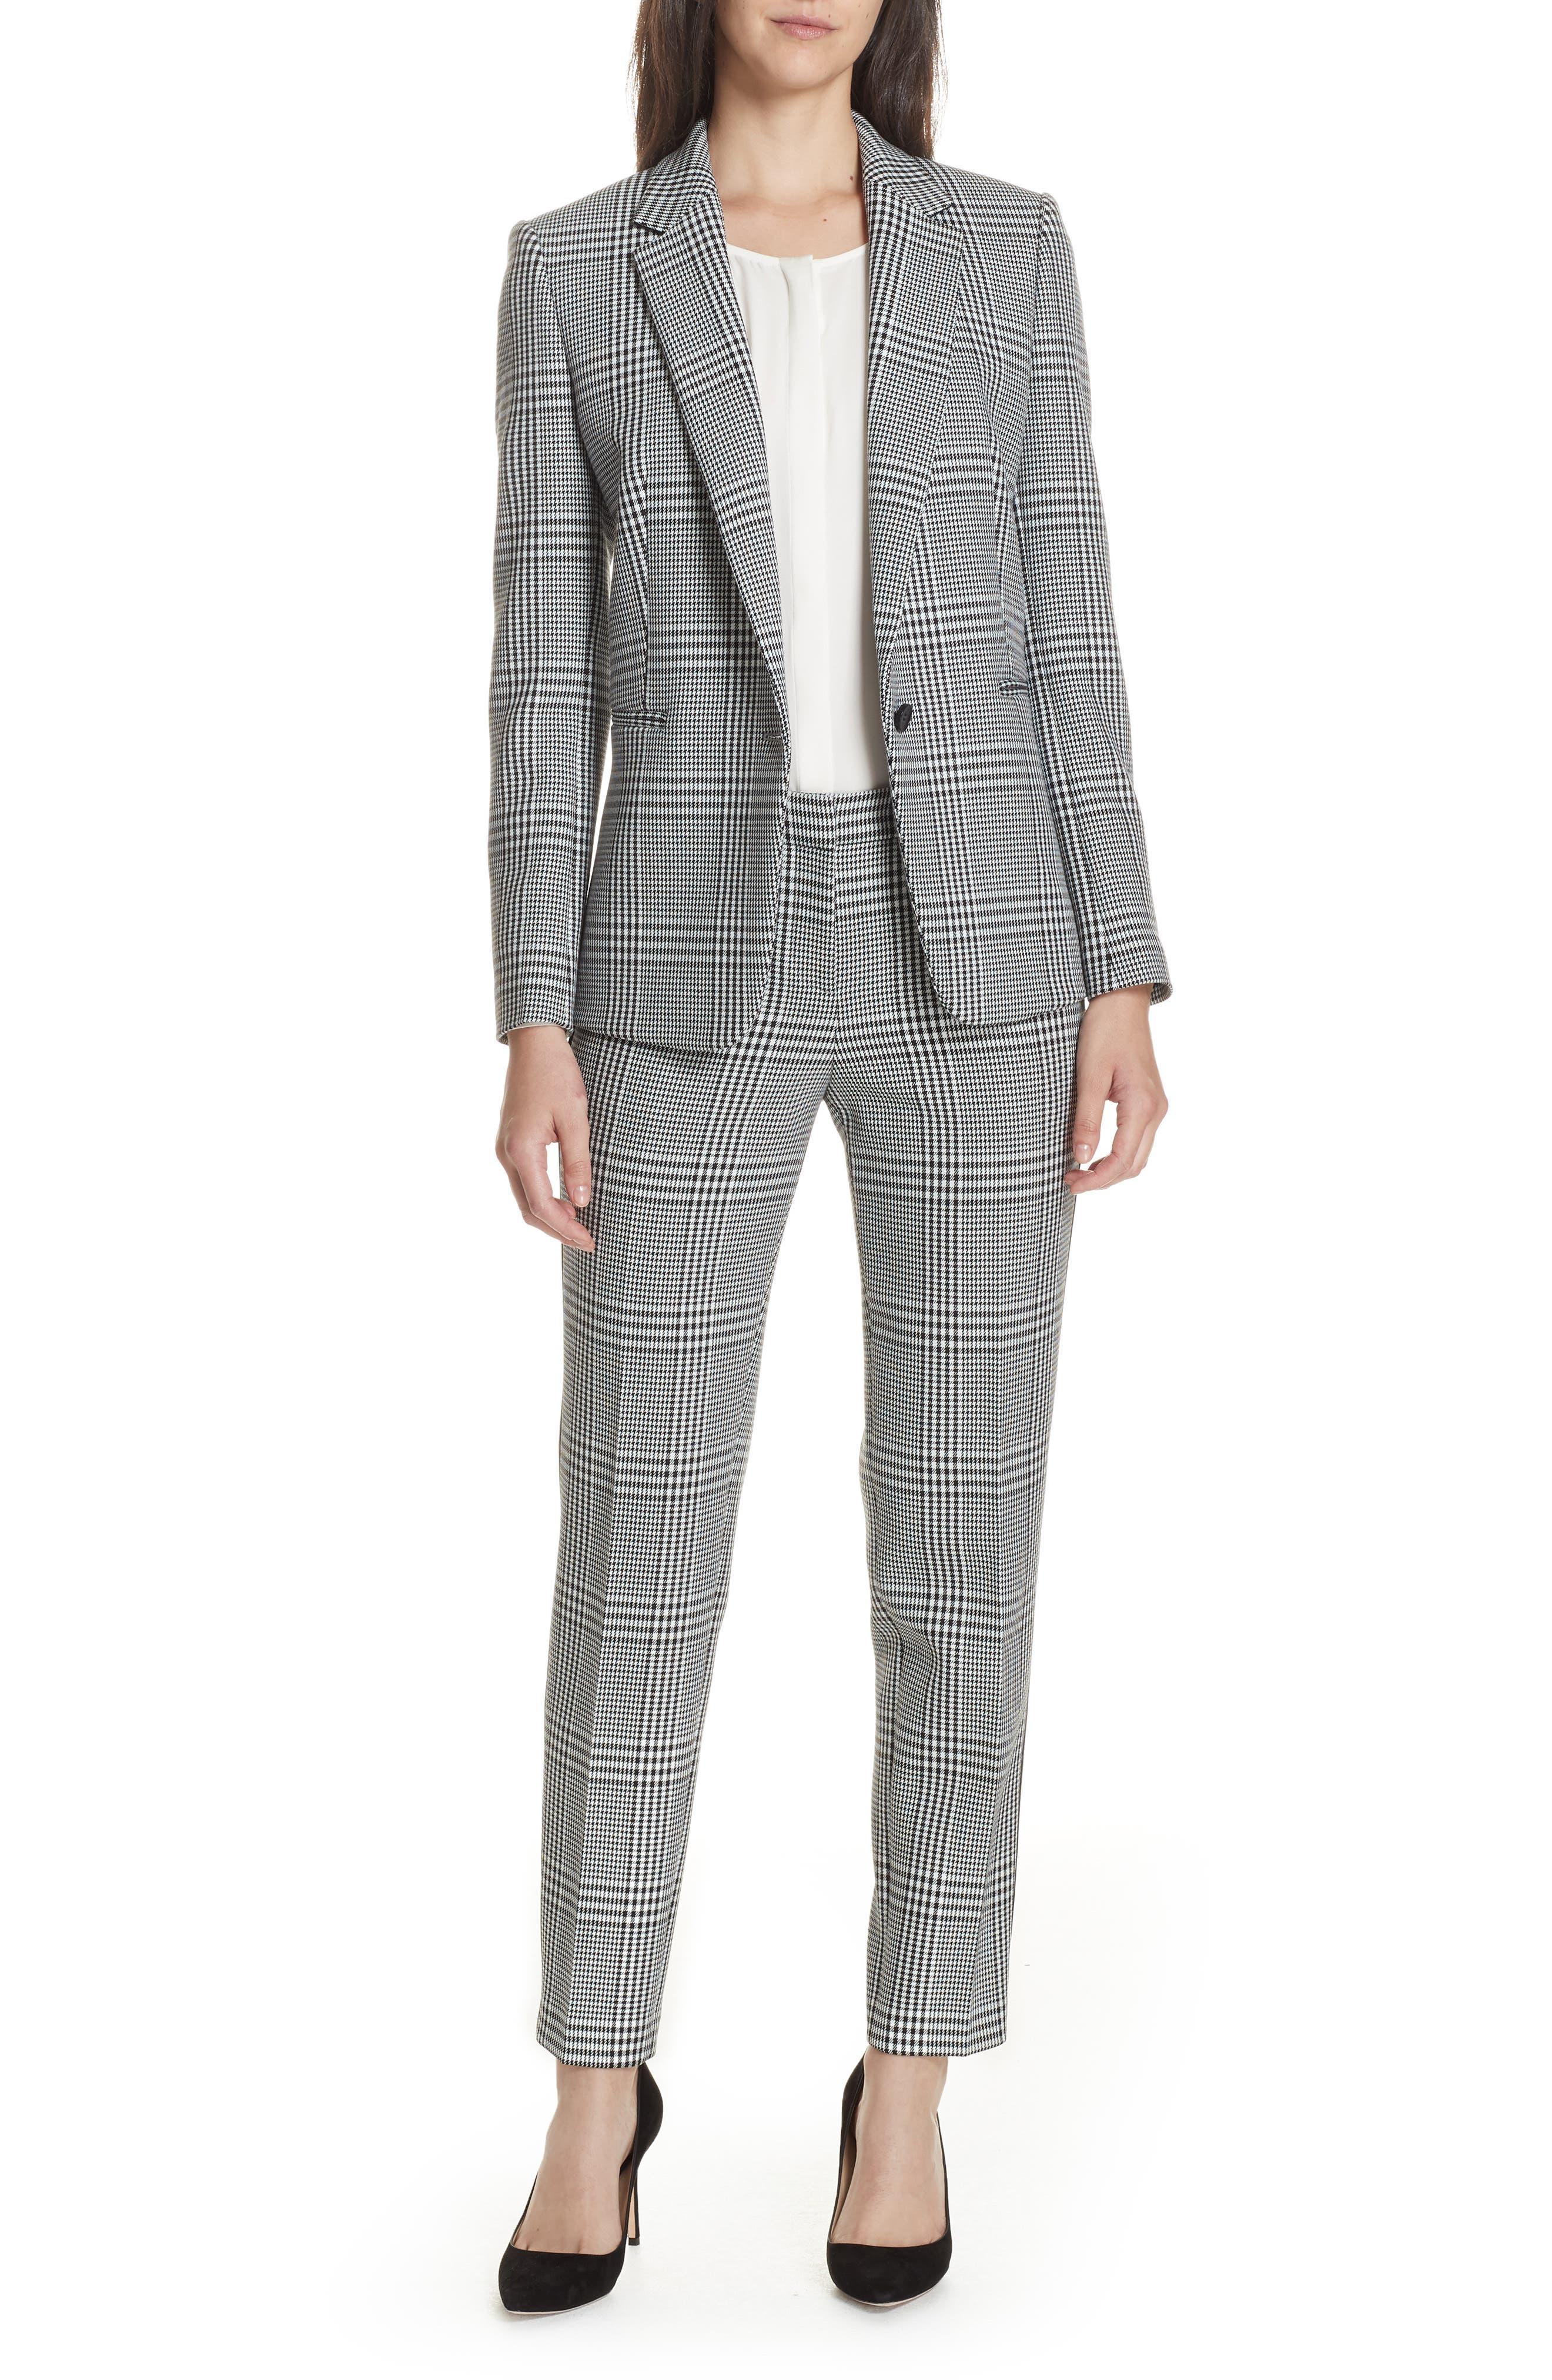 Jemaromina Glen Plaid Suit Jacket,                             Alternate thumbnail 7, color,                             GLENCHECK FANTASY